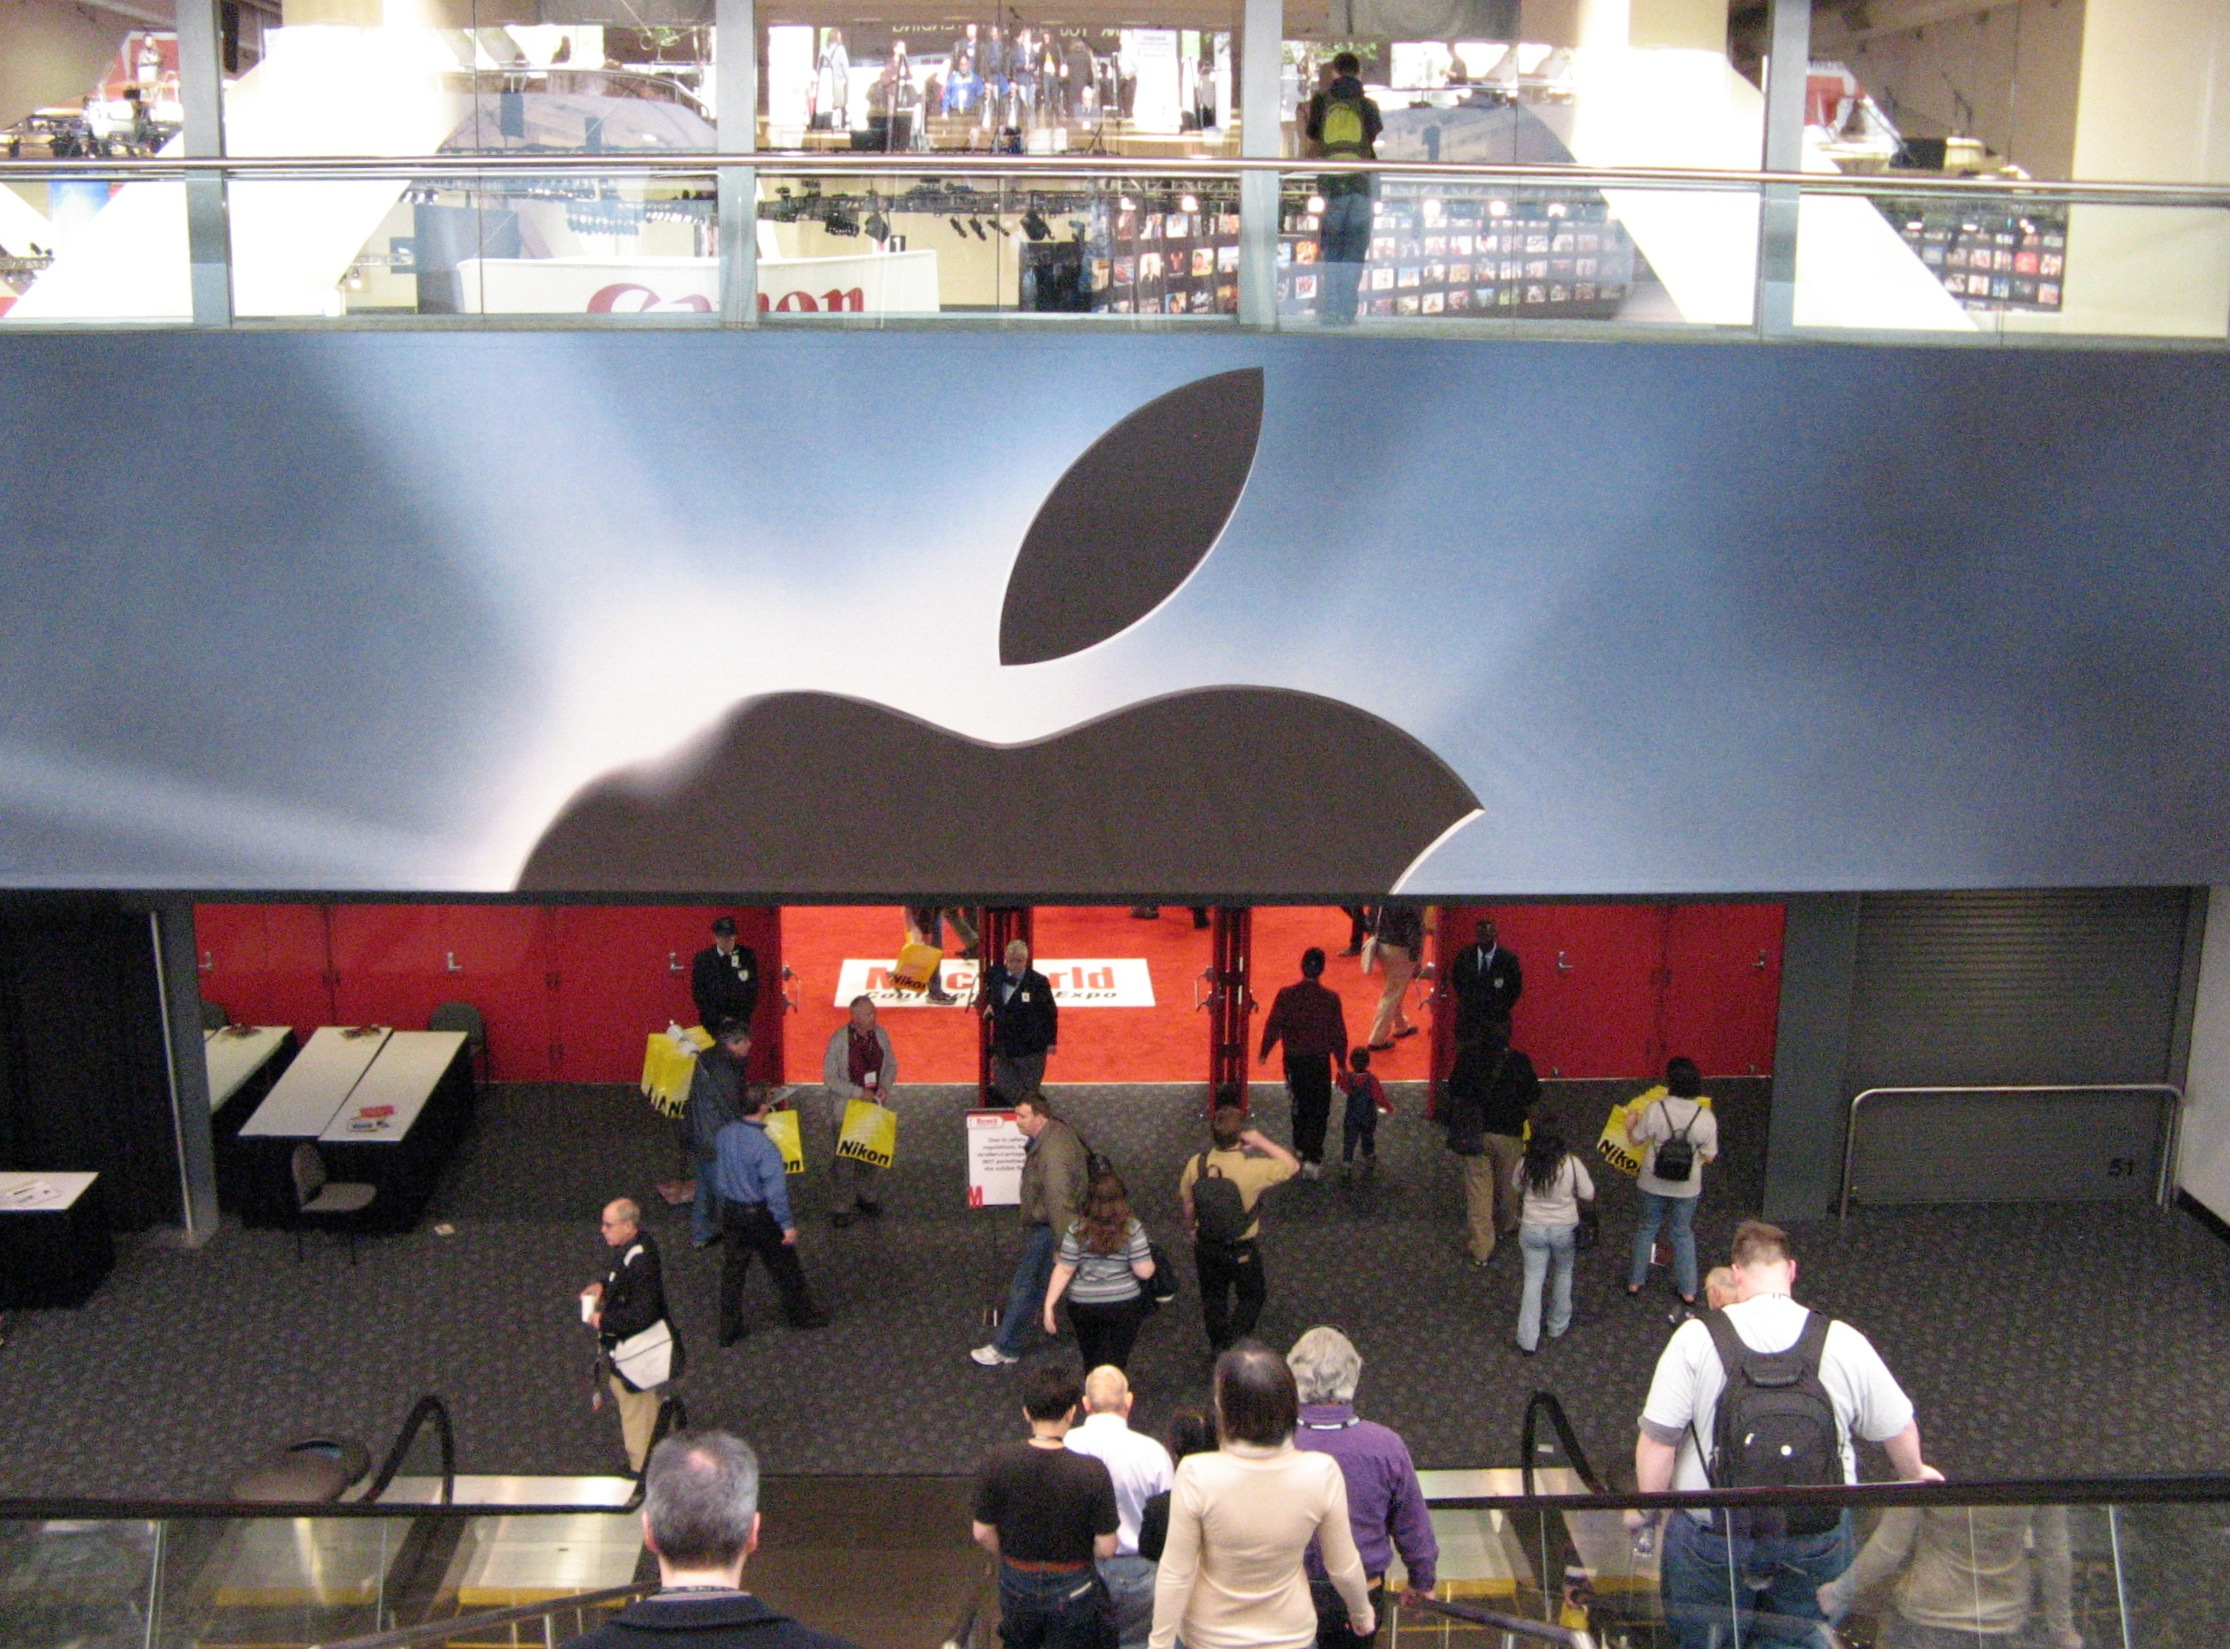 Down the Escalator into the MacWorld Show Floor